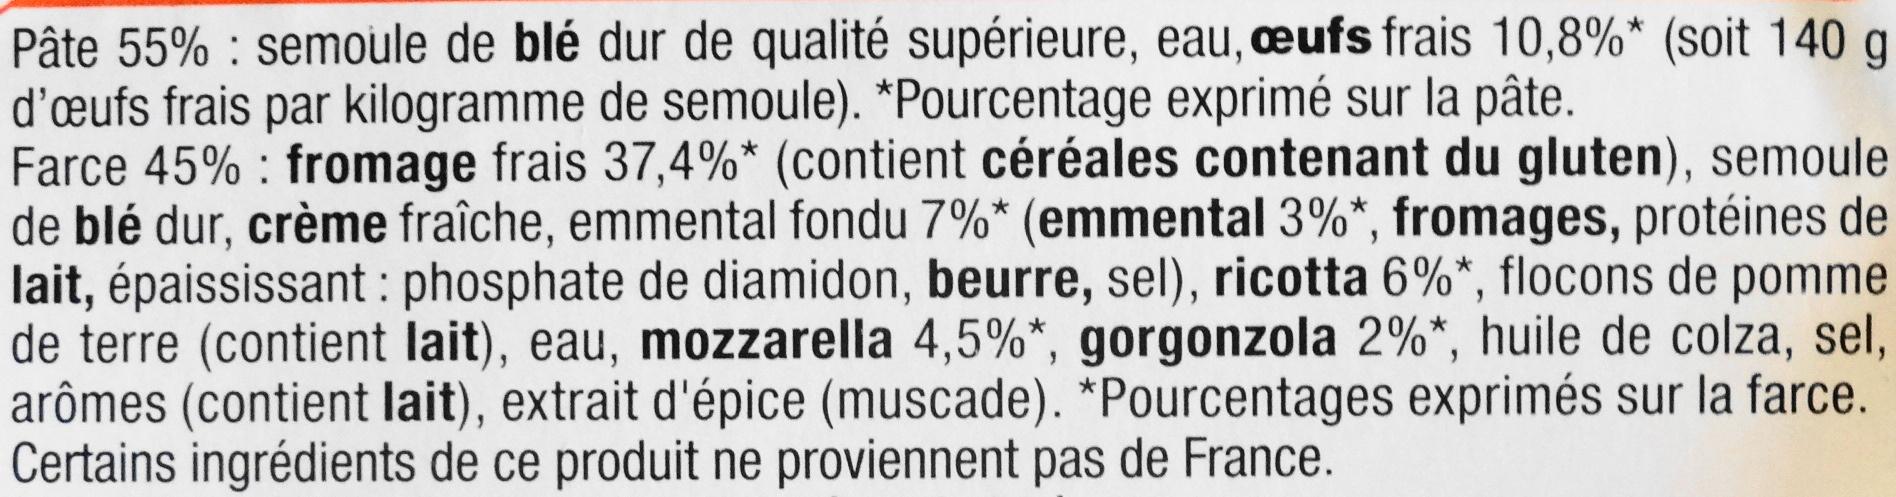 Ravioli, aux oeufs frais,  5 fromages - Ingredients - fr